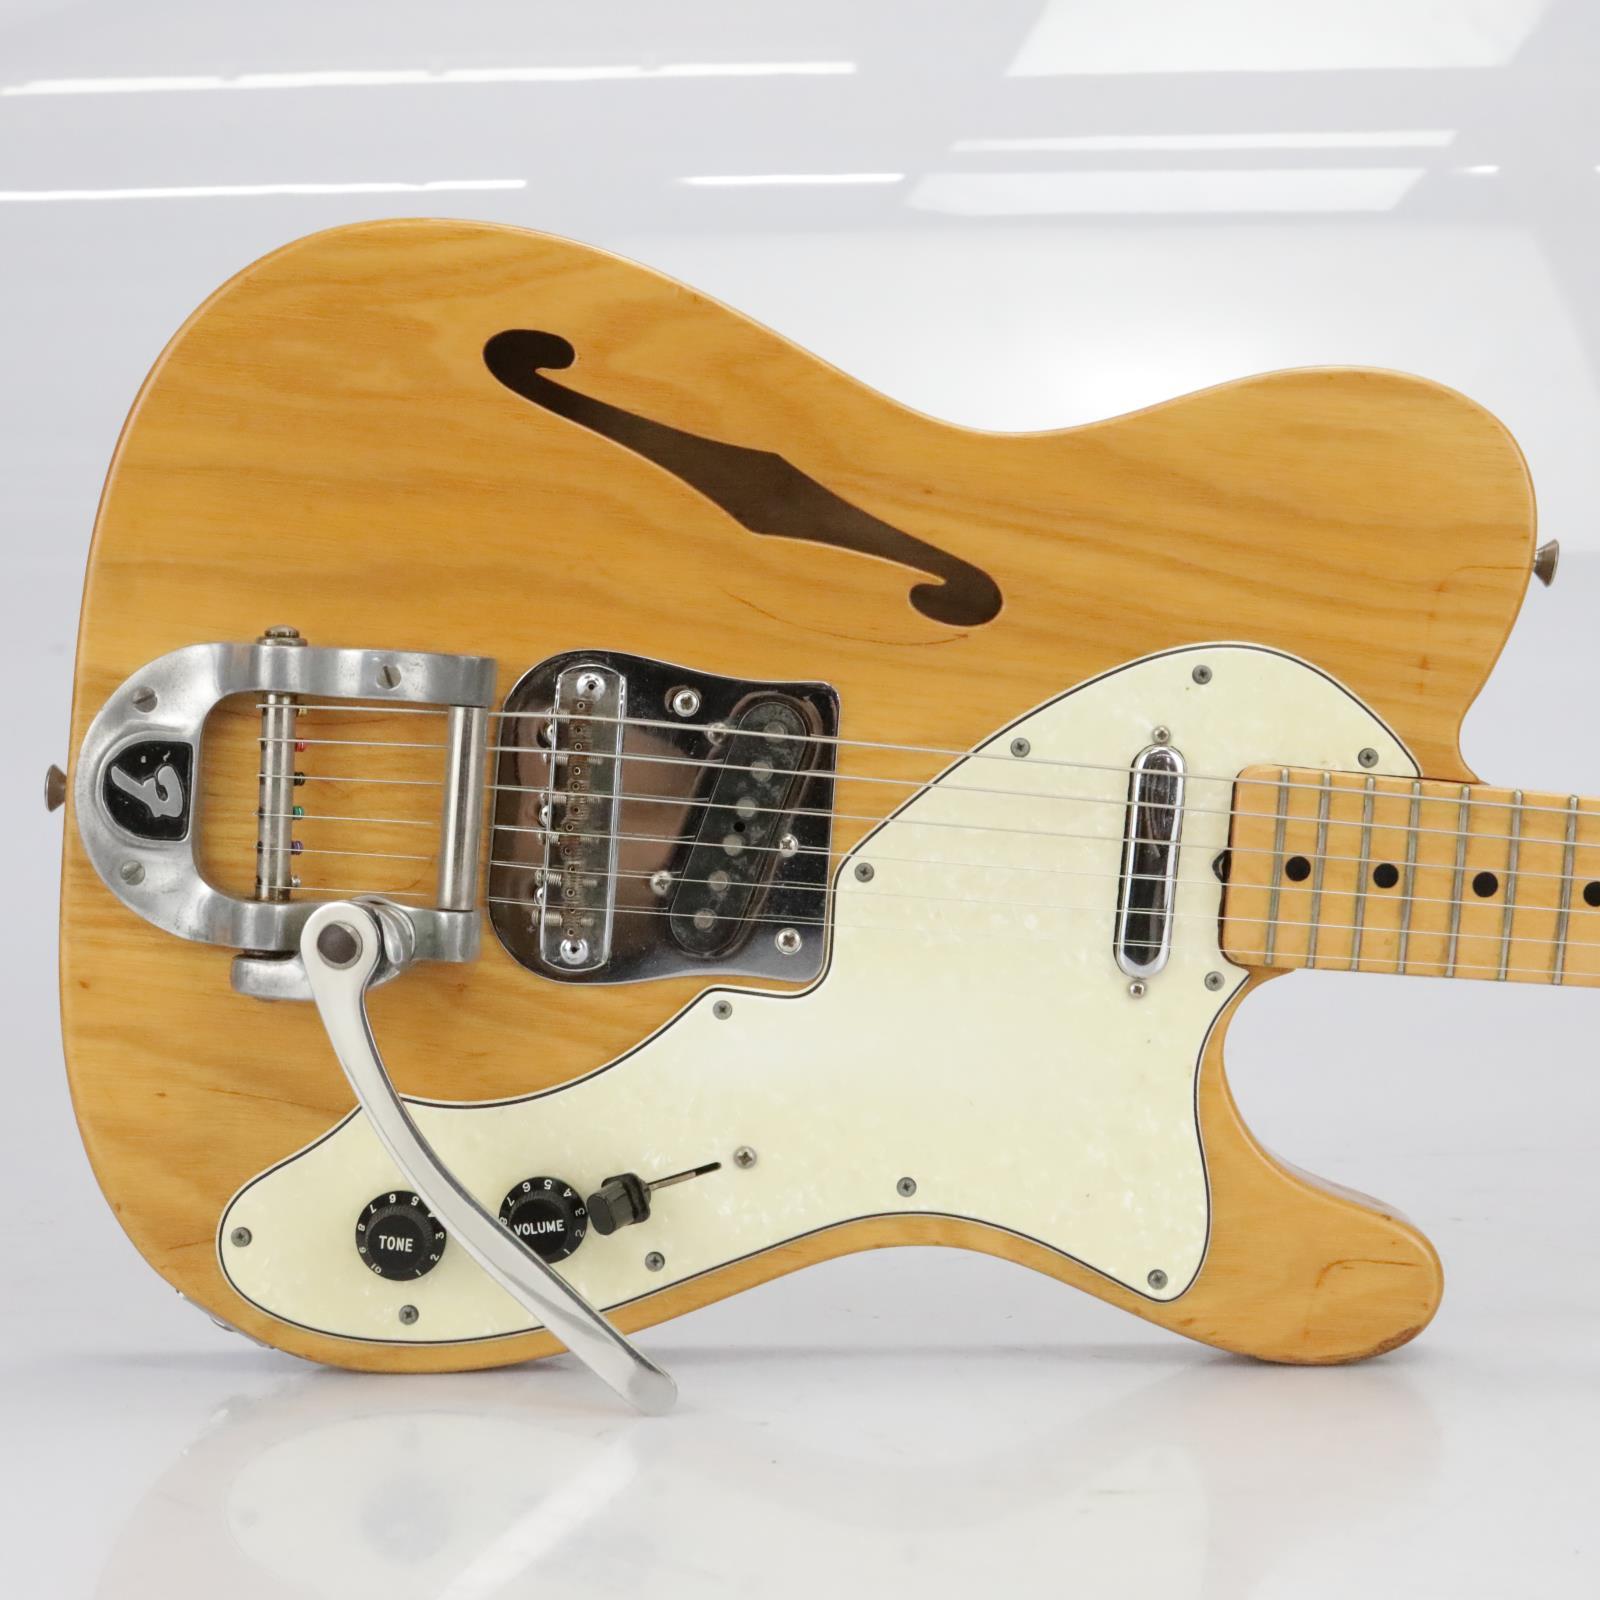 1970 Fender Telecaster Thinline Natural Tele w/ Bigsby Tremolo #40185